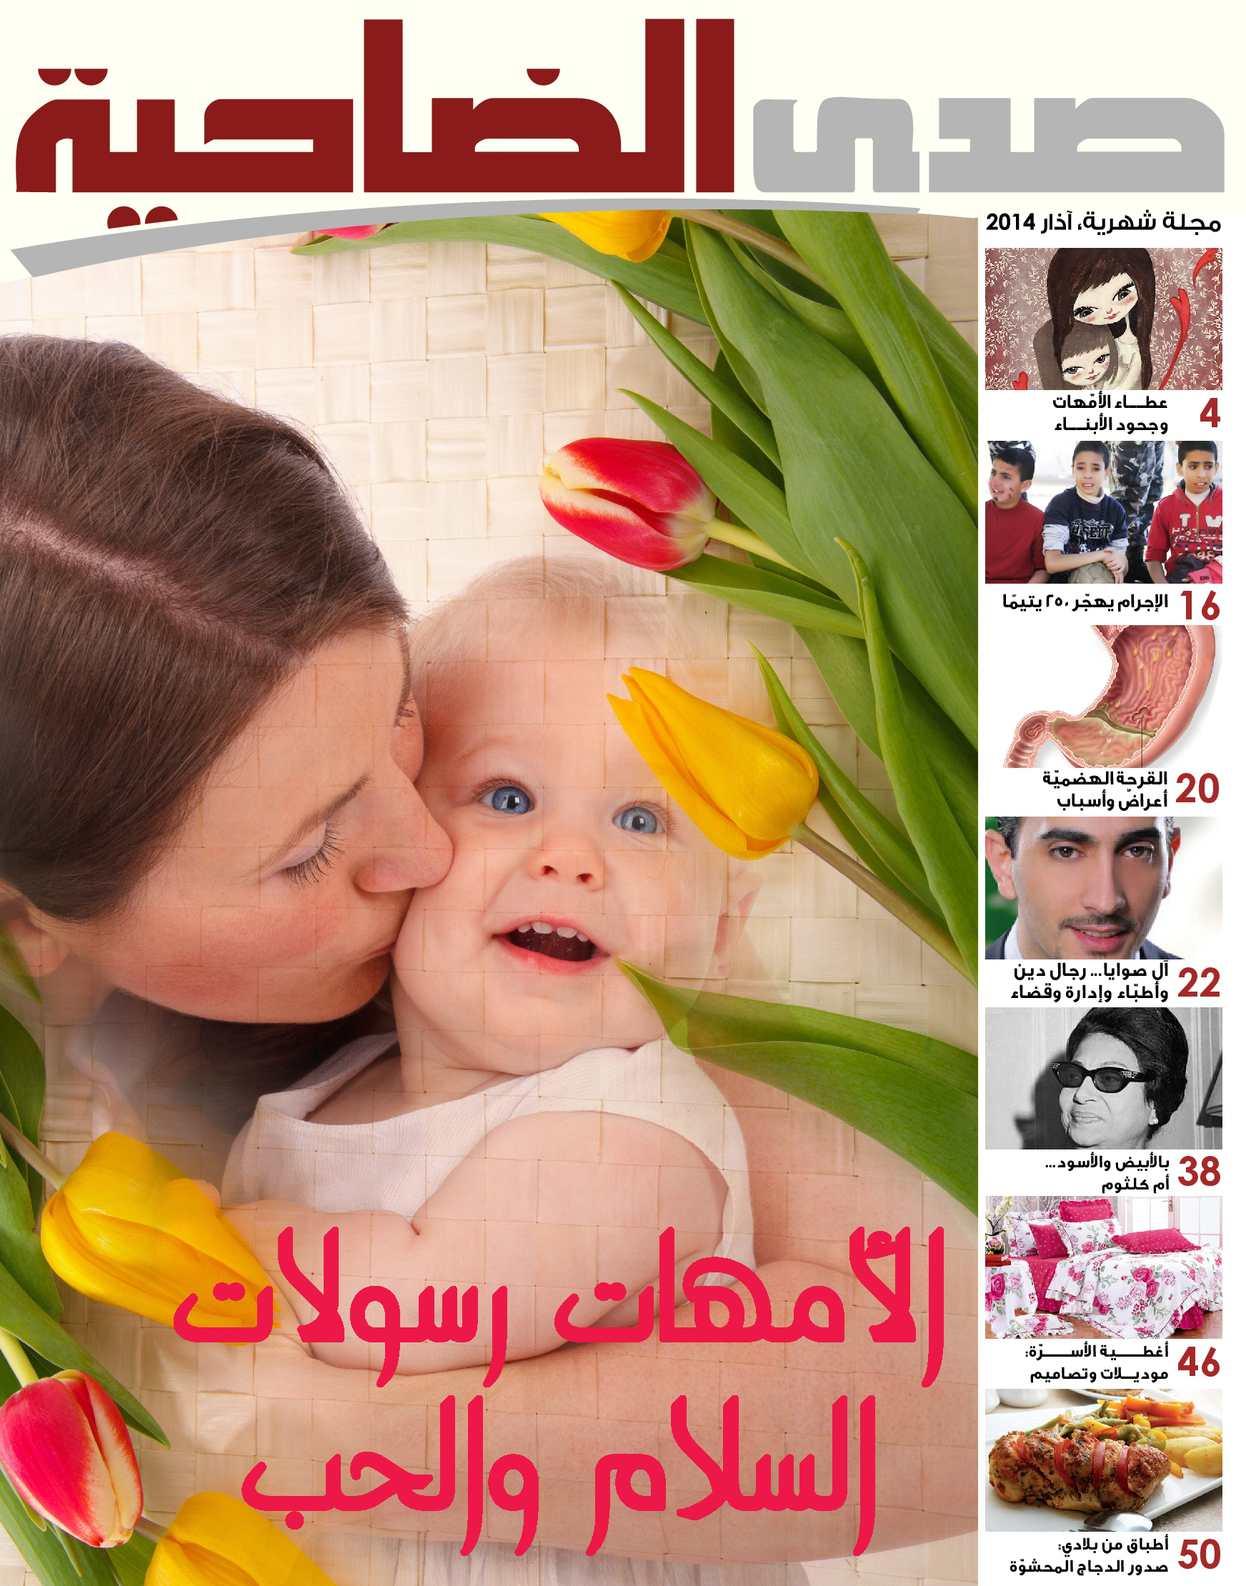 c8cacd8c9fffc Calaméo - Sada Al-Dahieh - 12